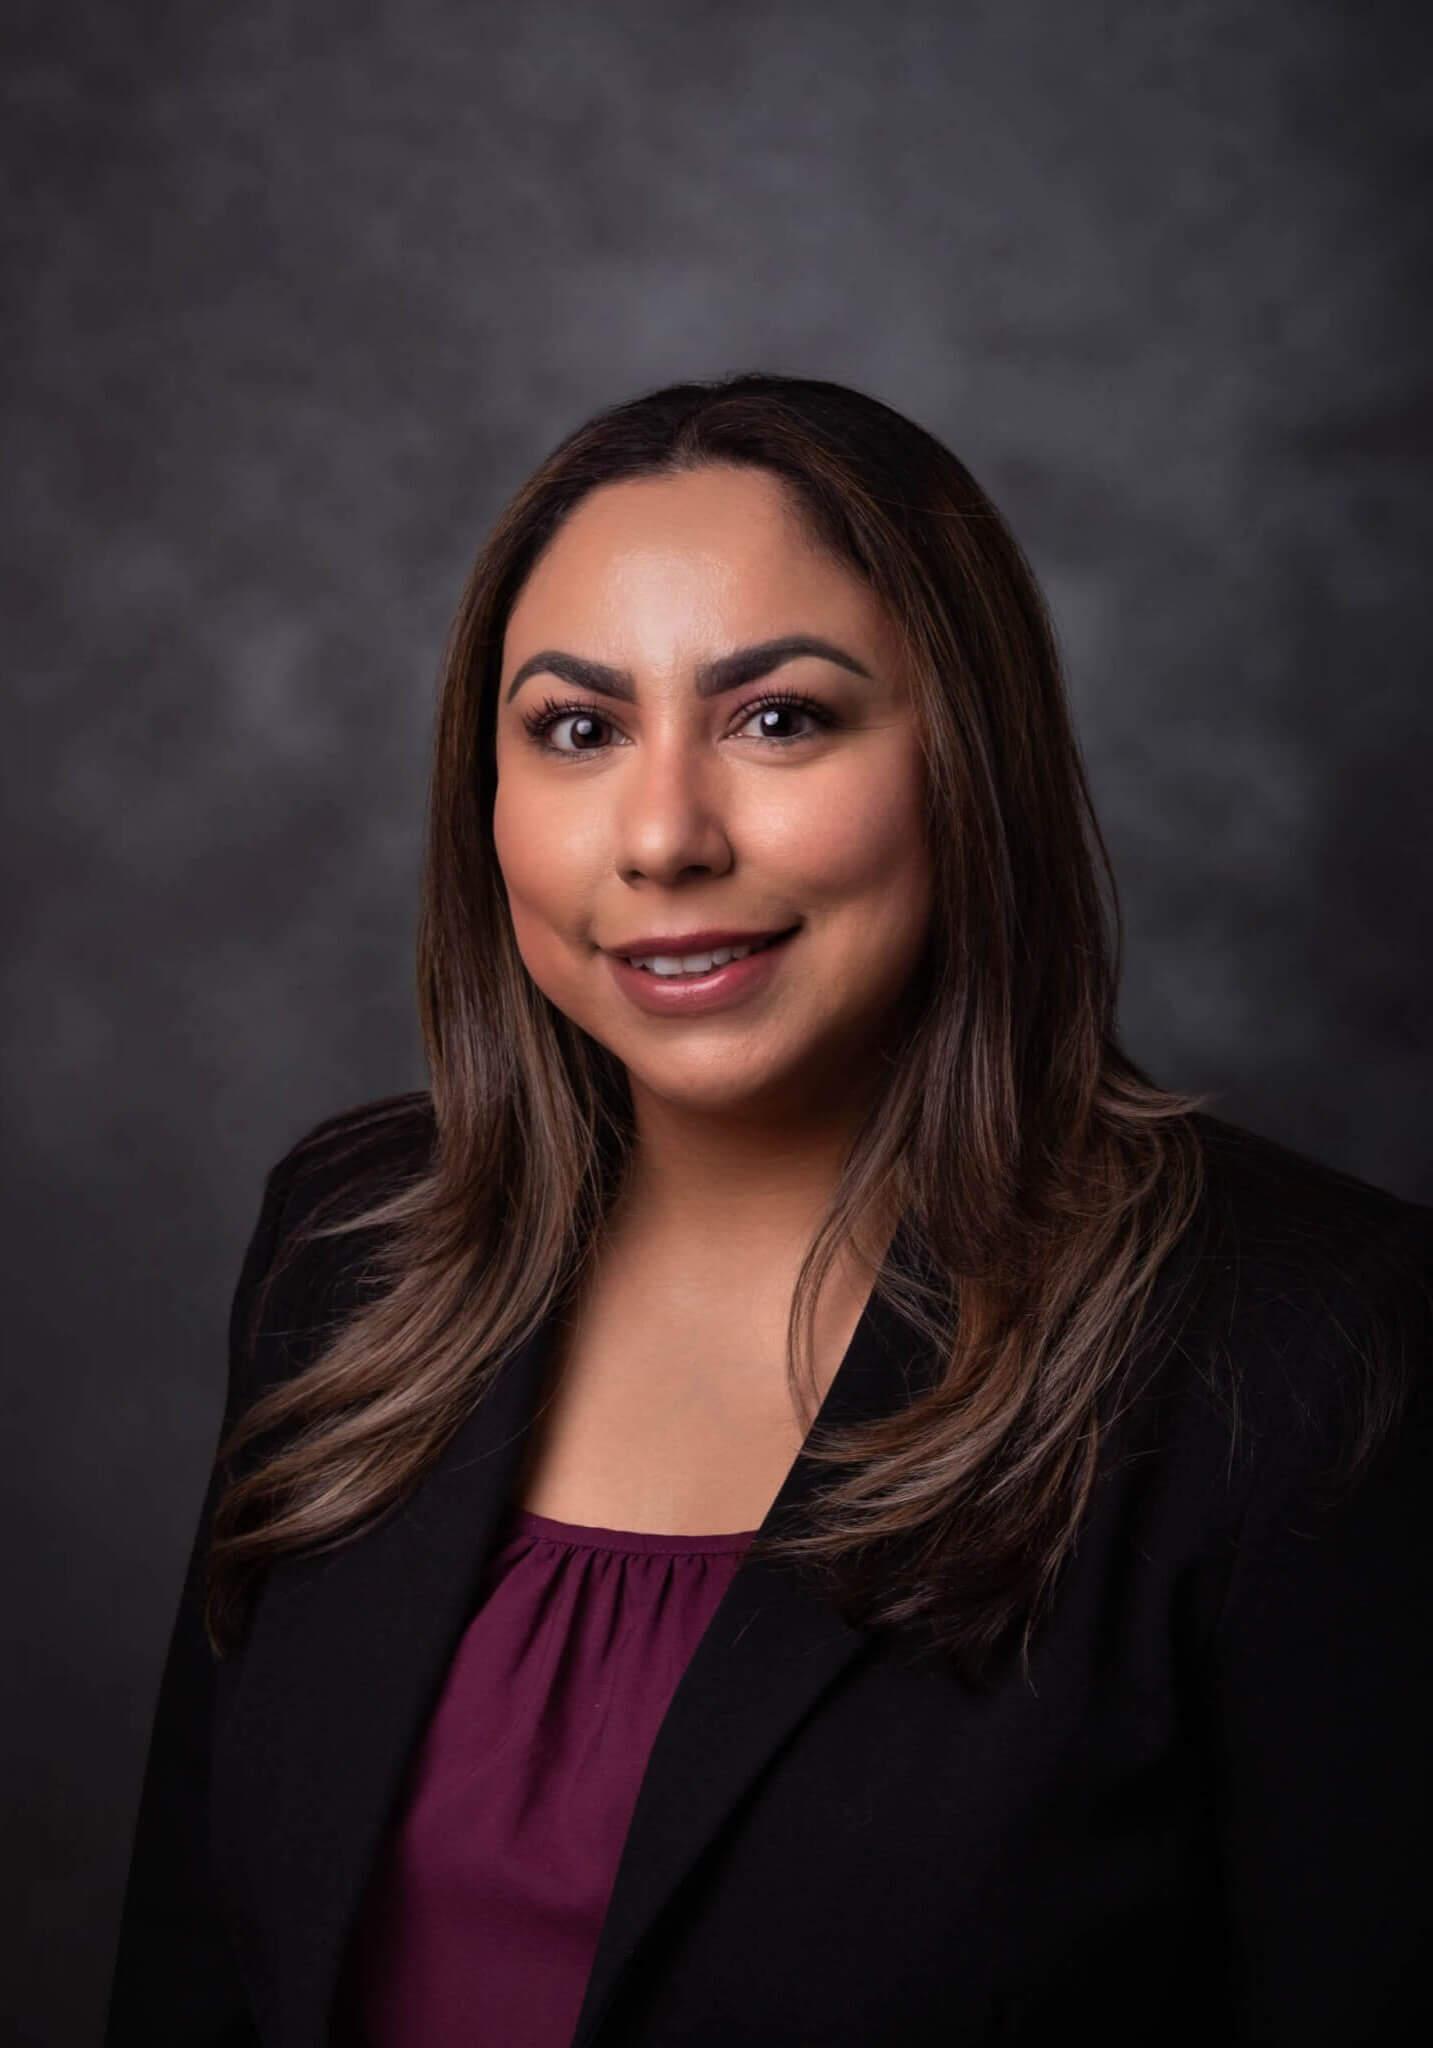 Valerie Casarez from ROI Properties